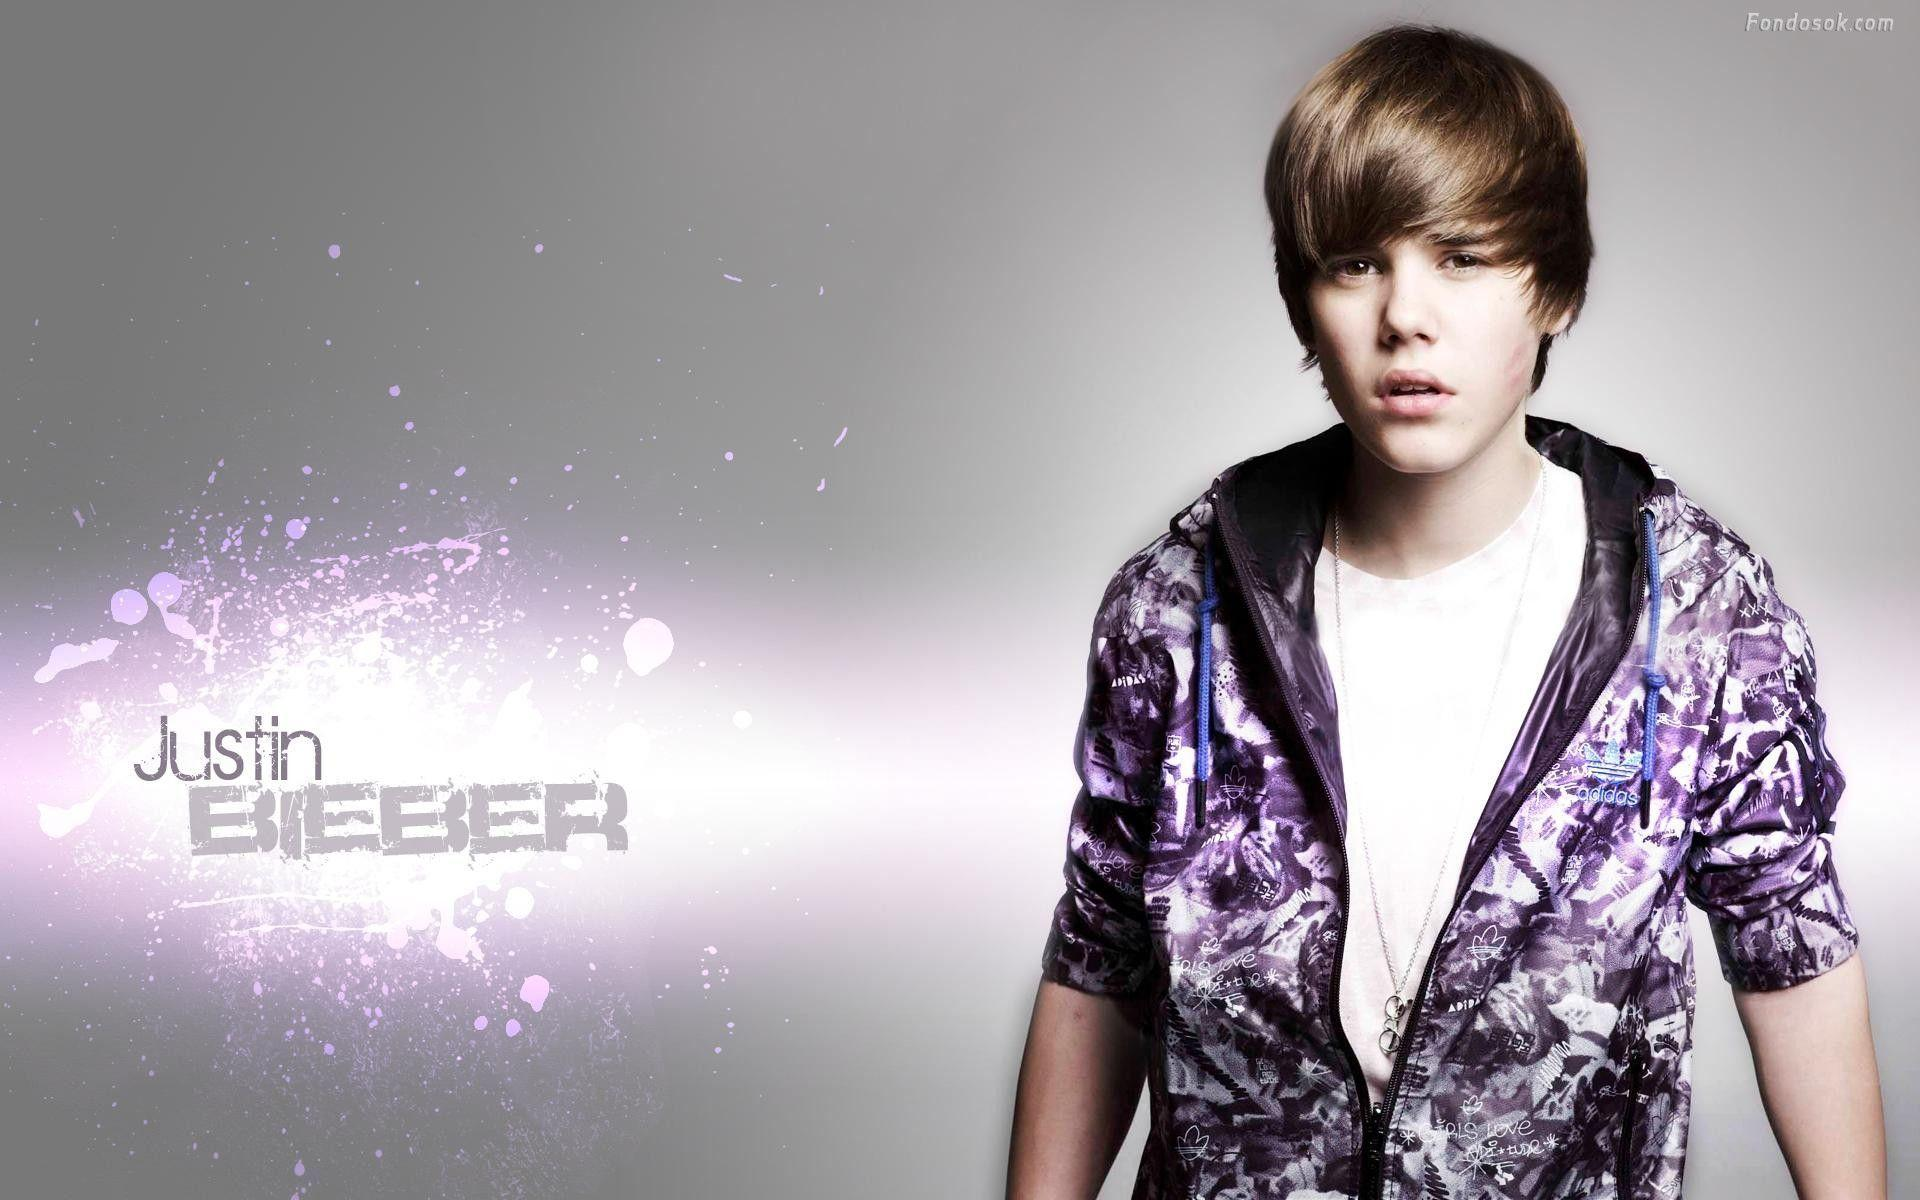 Justin Bieber Latest Photoshoot Full Hd Wallpaper: Justin Bieber New Wallpapers 2015